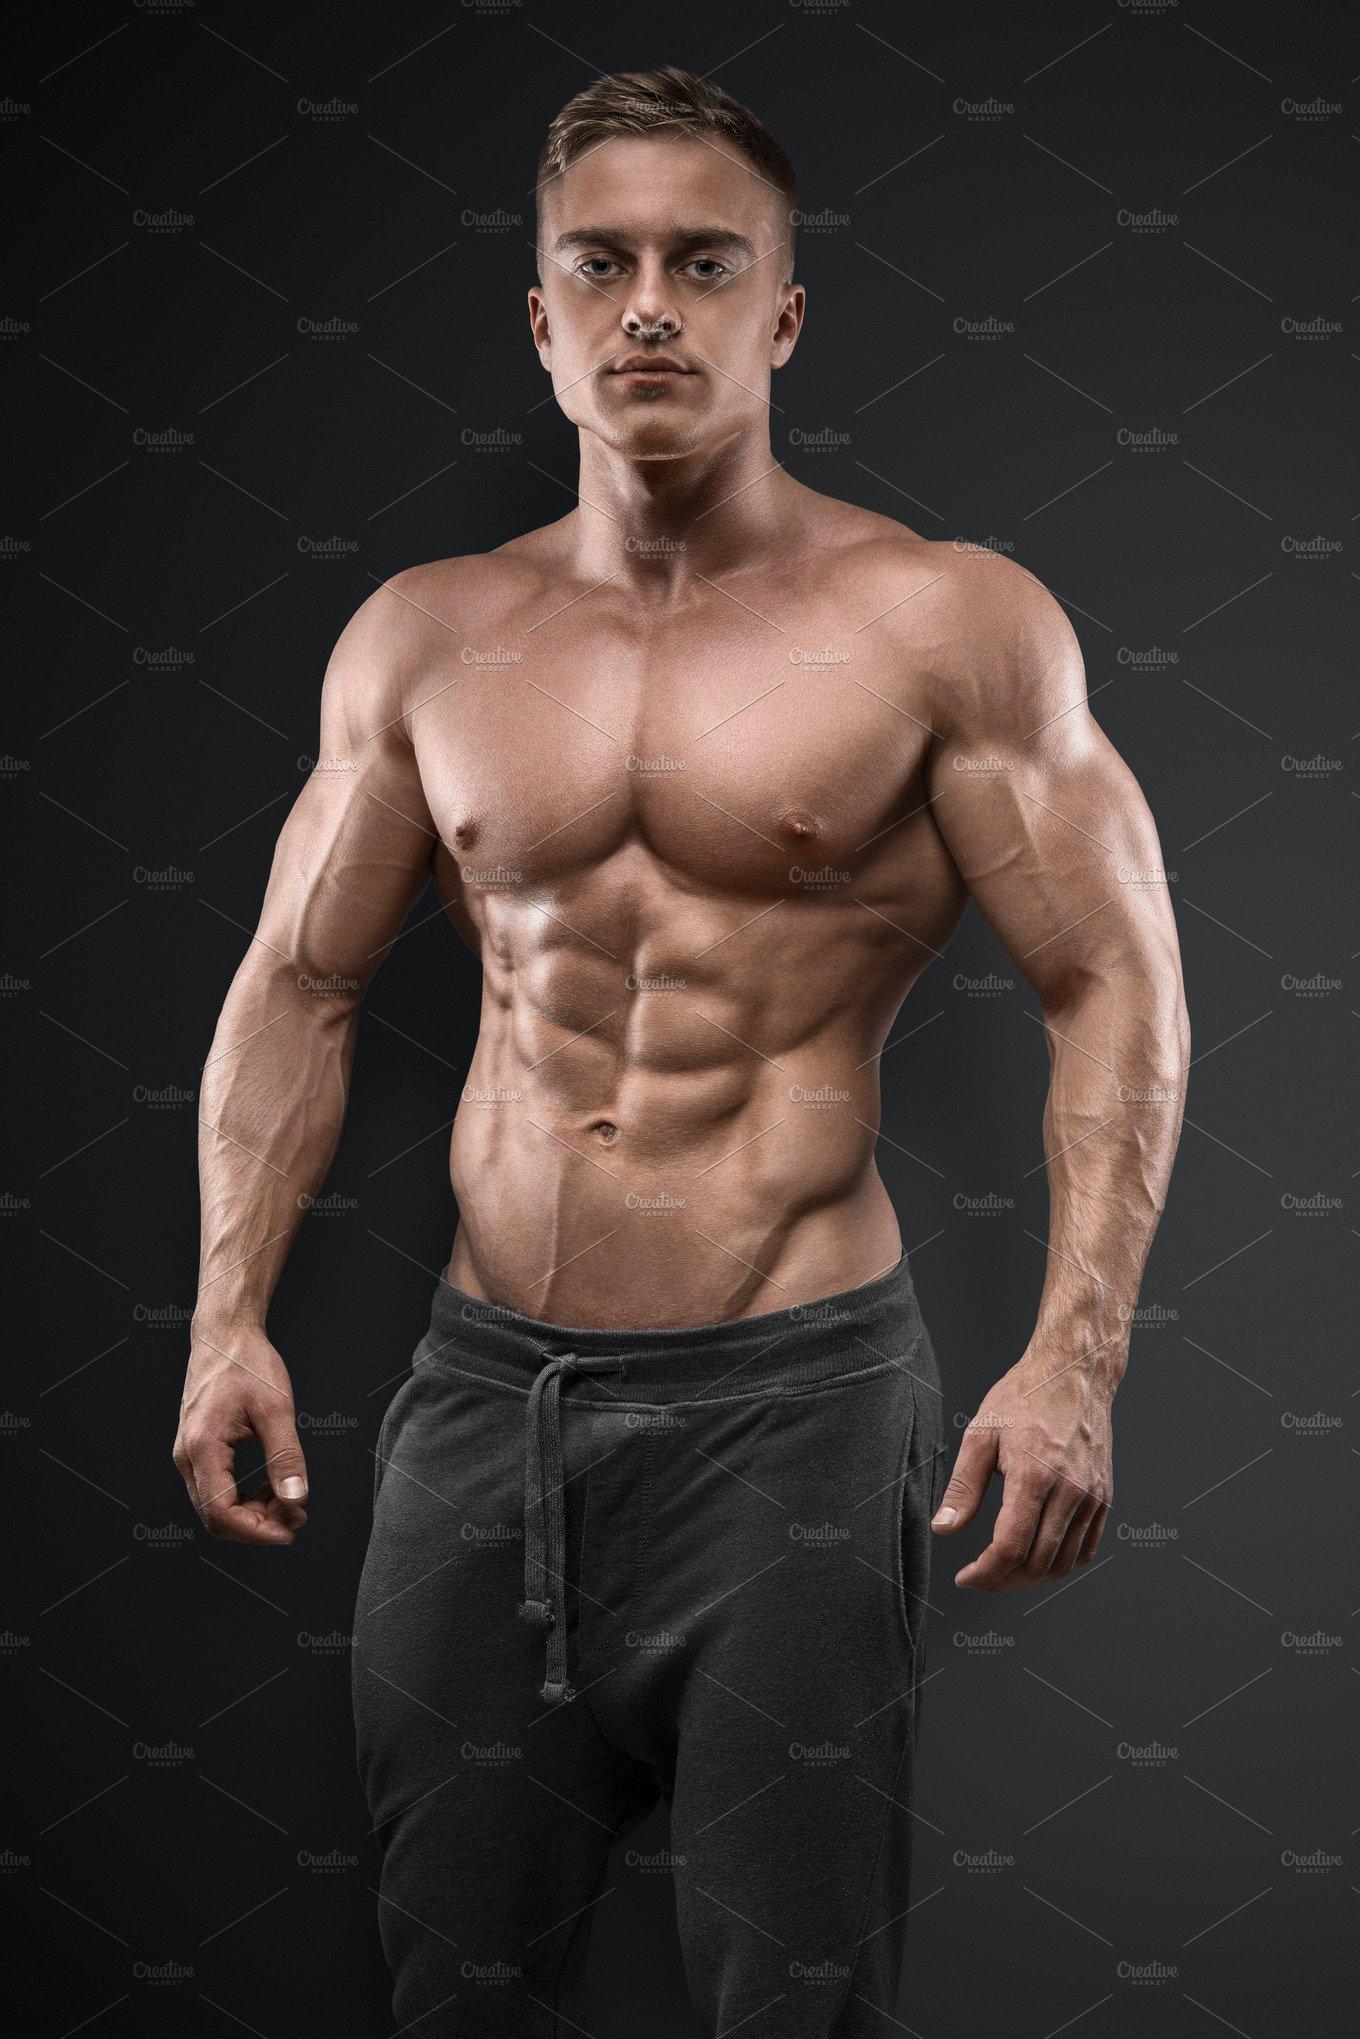 Muscle gallery: muscular black